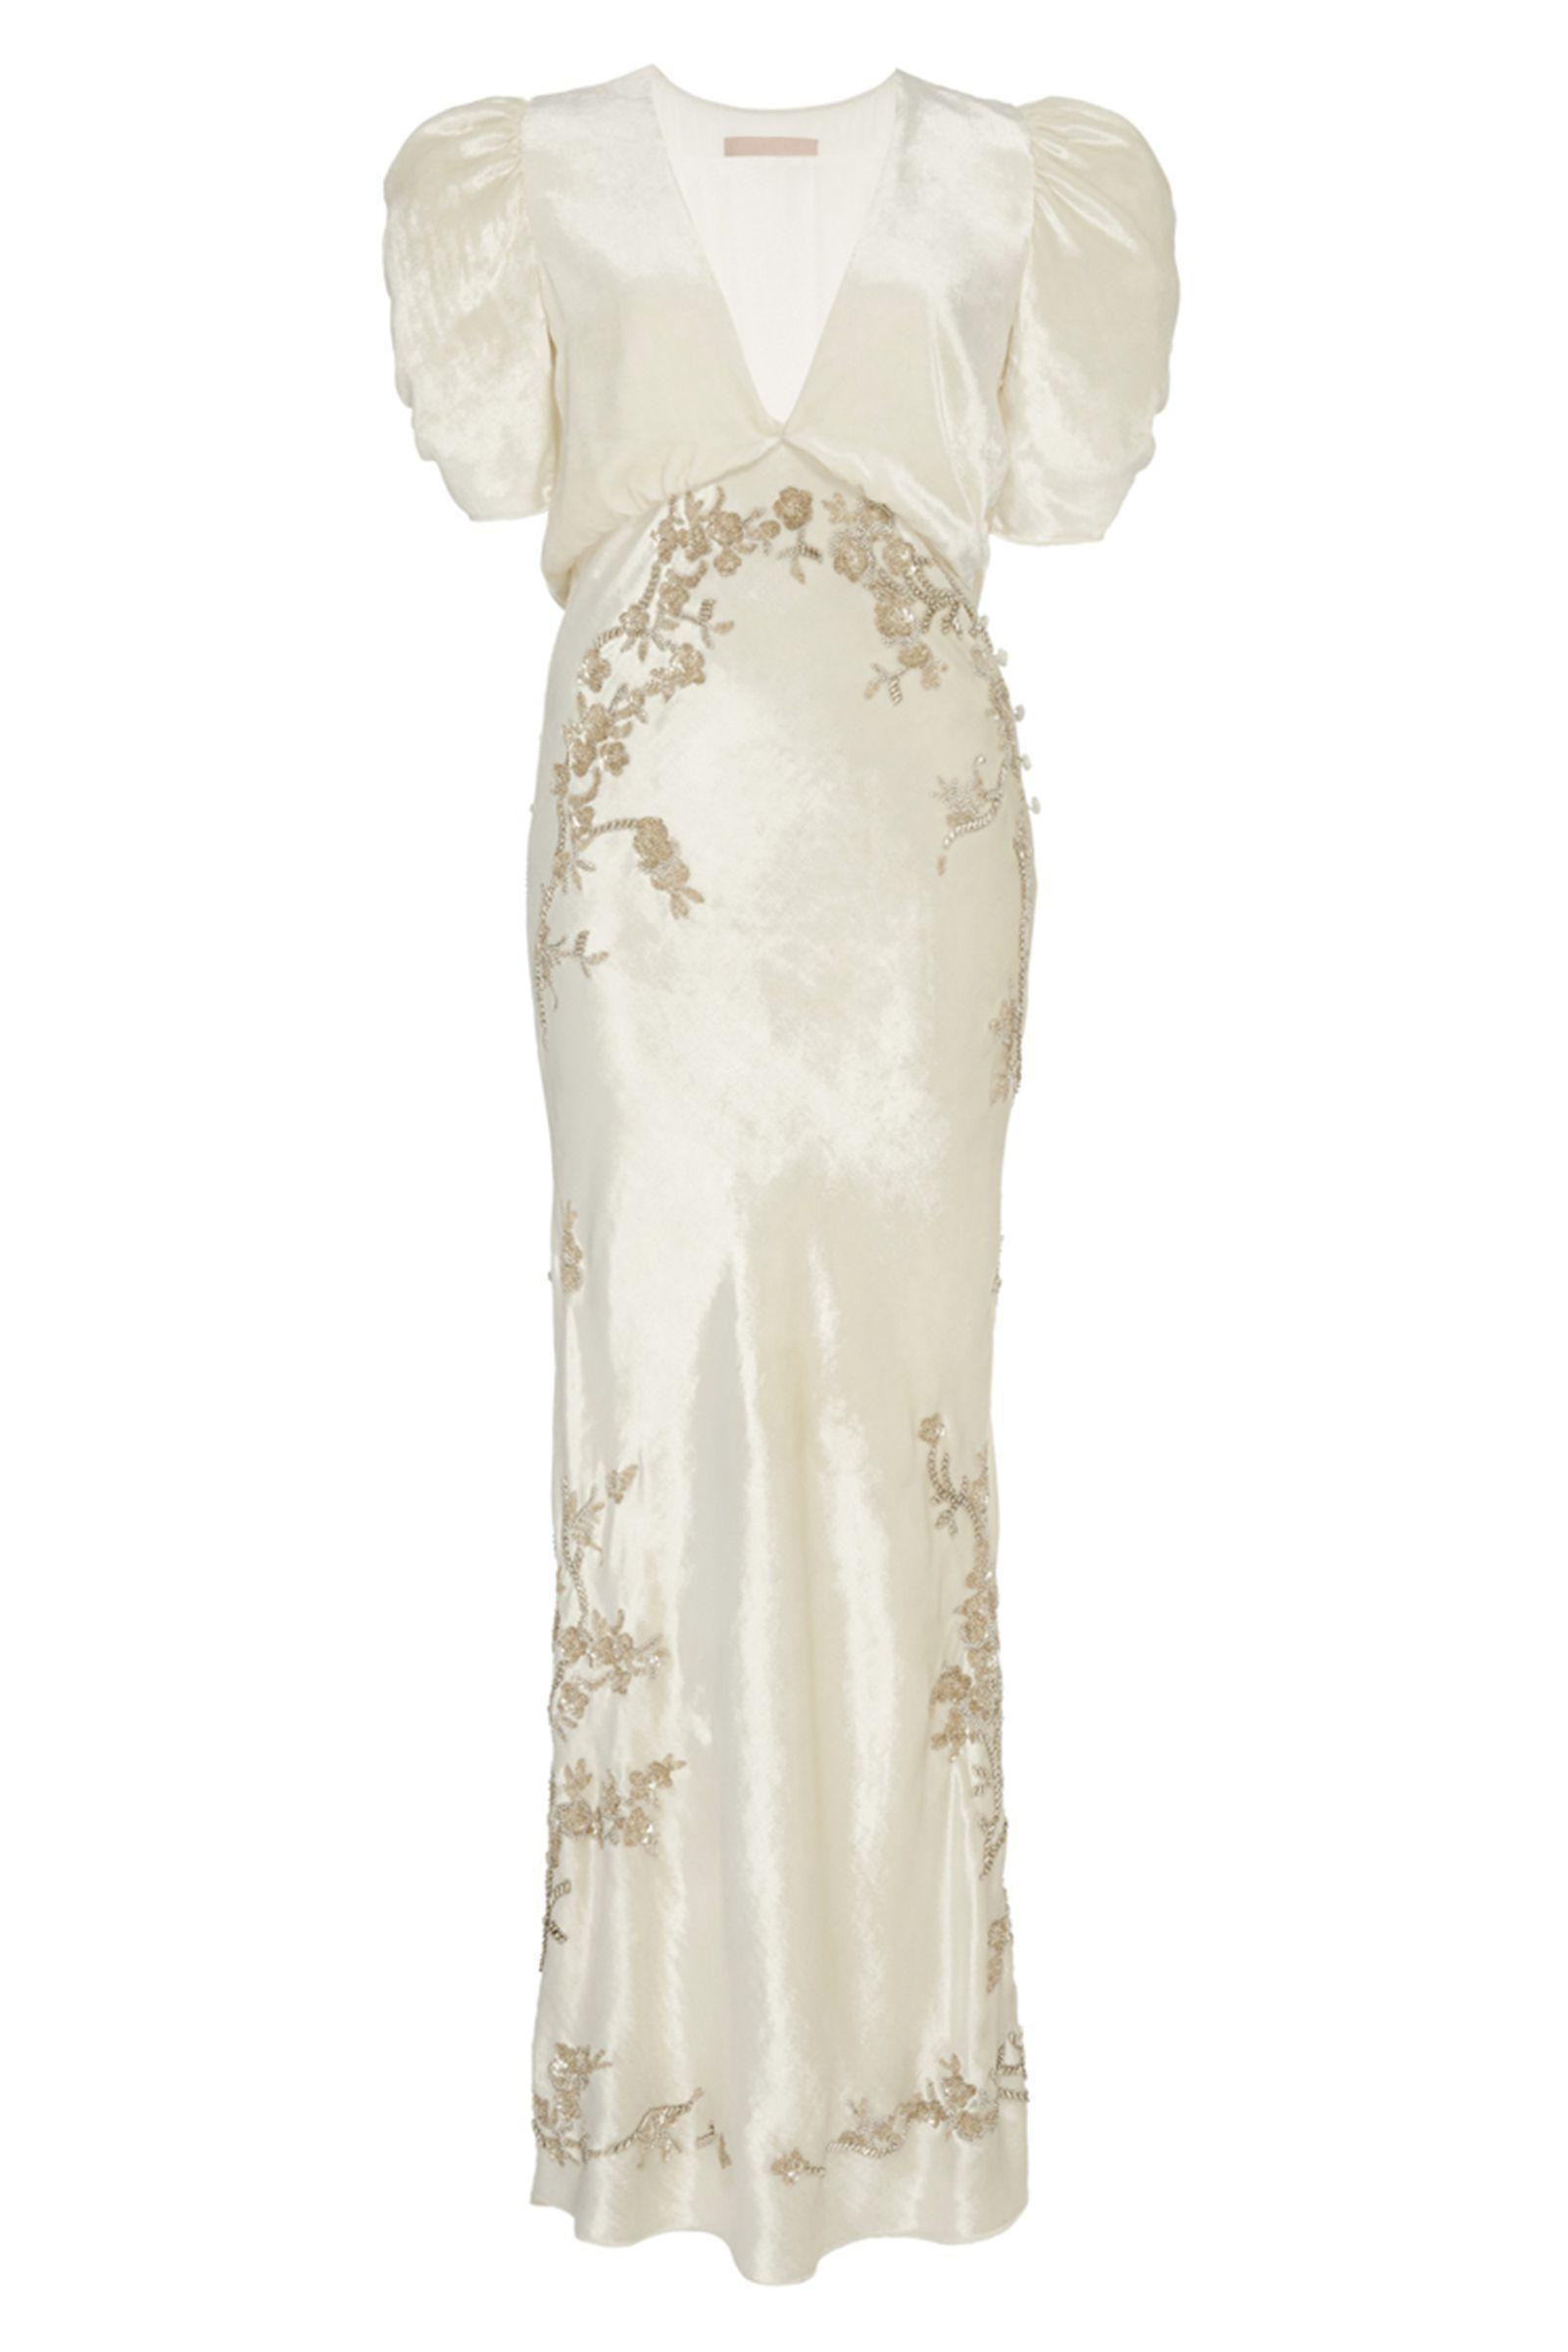 10 Less Fussy Second Wedding Dresses To Wear To The Reception Wedding Dress Long Sleeve Dresses Linen Wedding Dress [ 2400 x 1600 Pixel ]